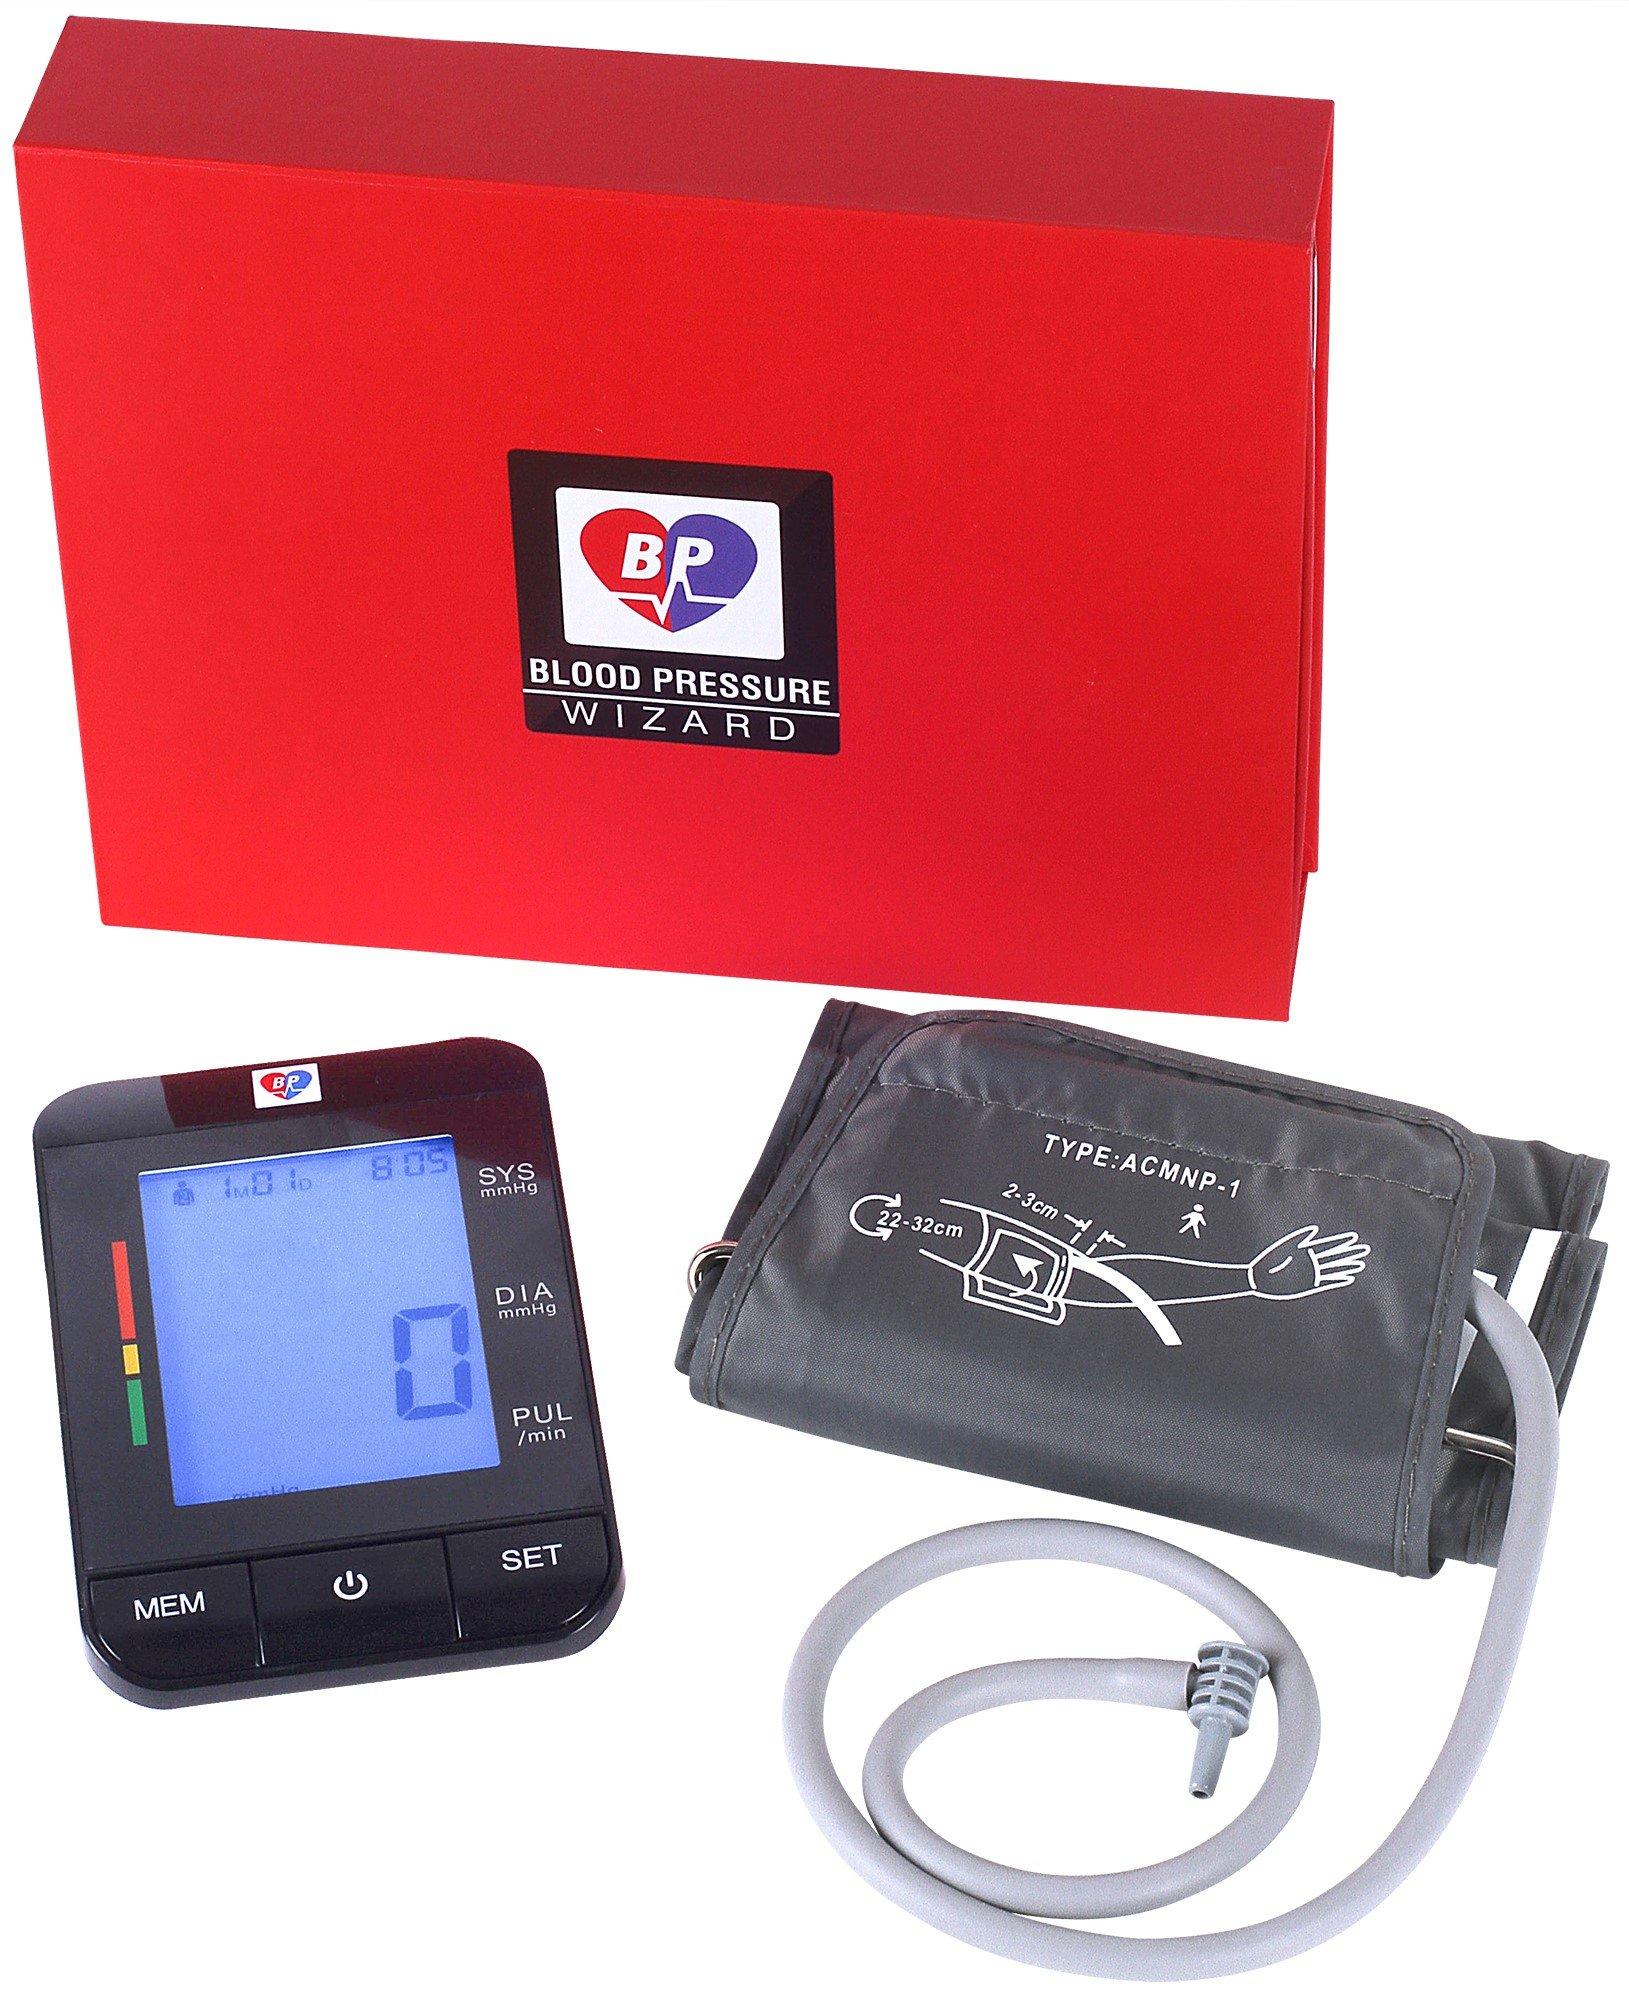 Professional Blood Pressure Monitor Super Bright Digital Display 99.9% Digital Accuracy BP Wizard